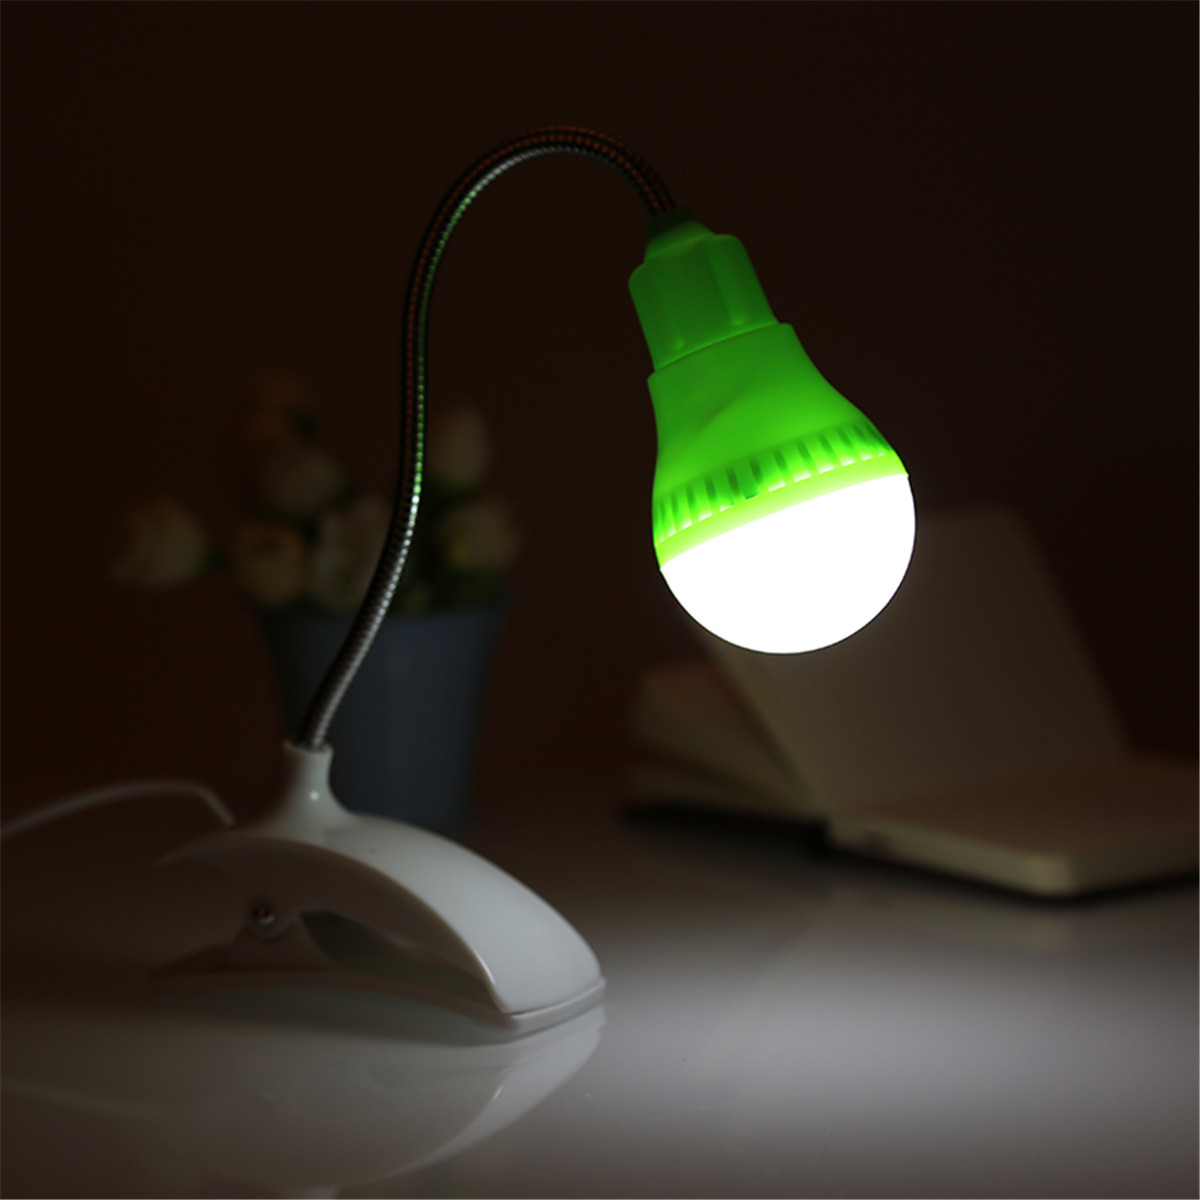 360 adjustable usb plug led clamp night light portable. Black Bedroom Furniture Sets. Home Design Ideas